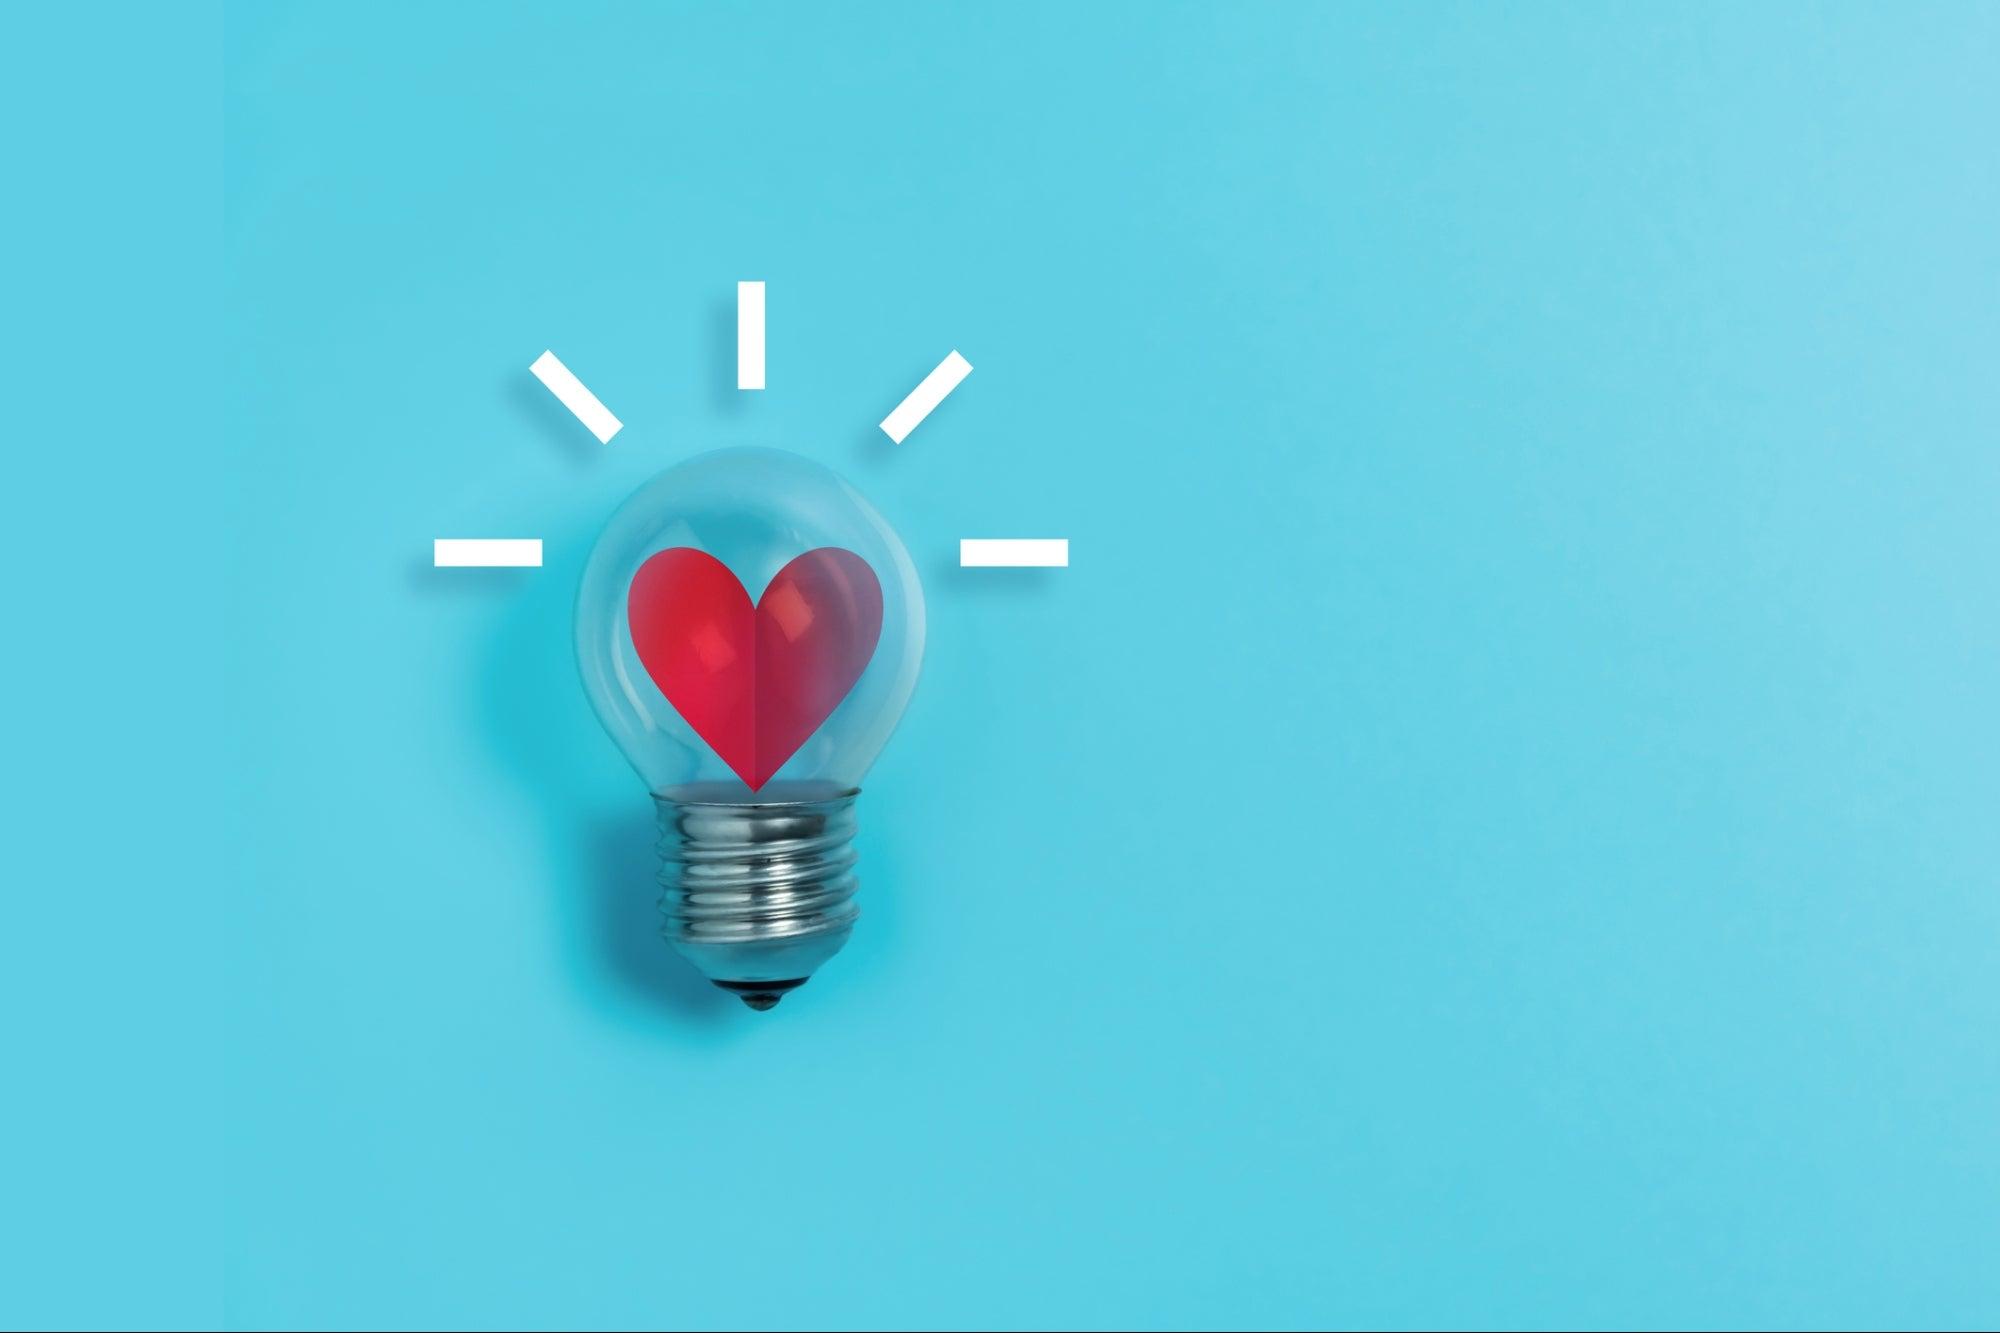 , Attention Brands: Kindness Sells, Saubio Making Wealth